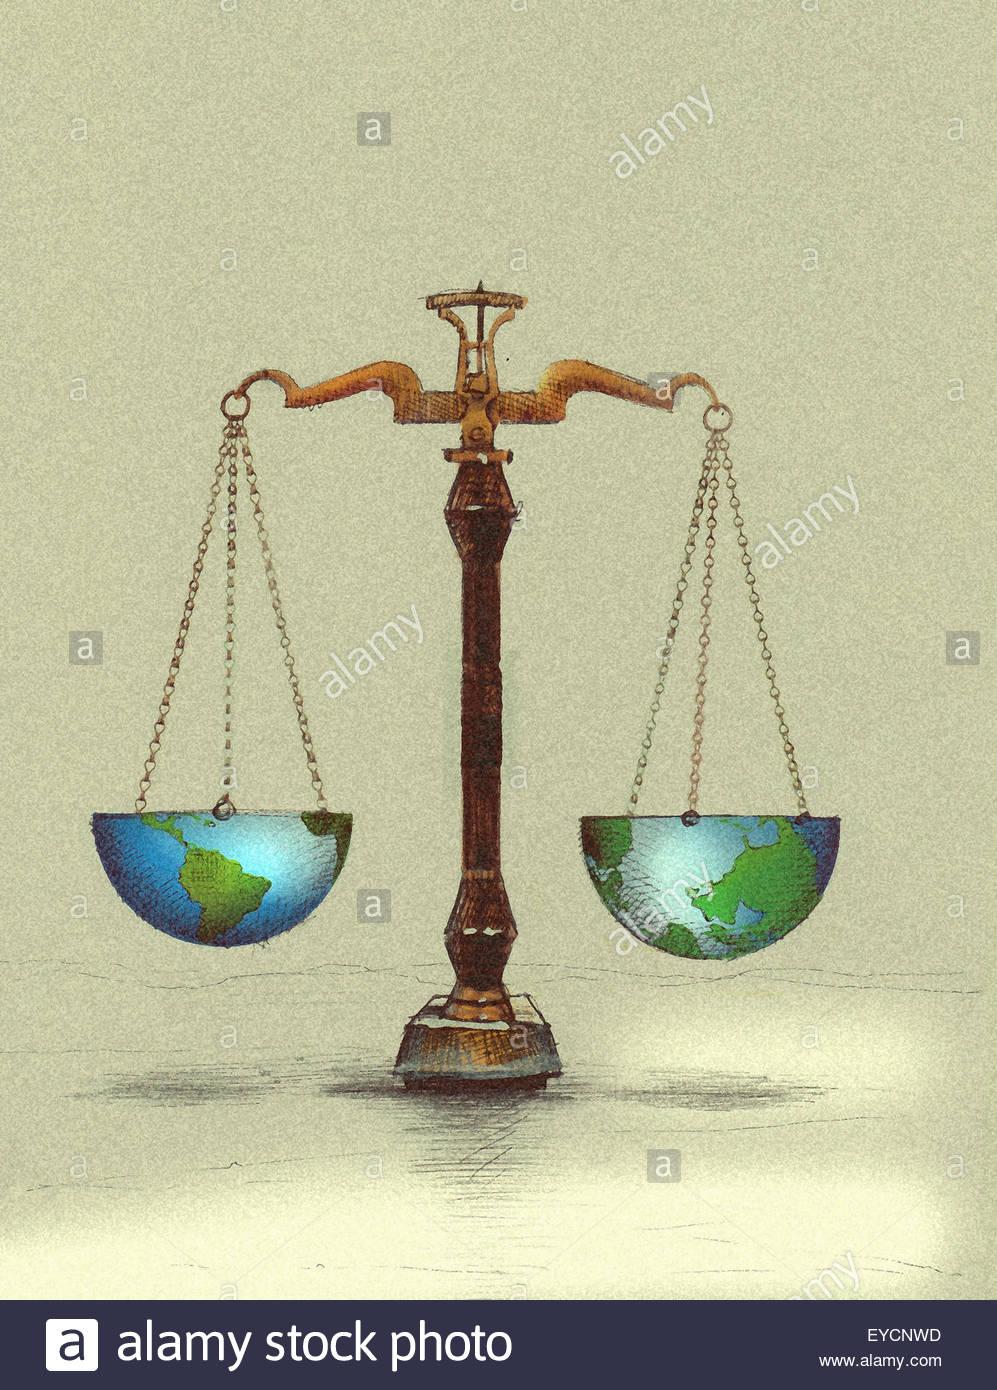 Scales balancing northern and southern hemispheres of globe - Stock Image